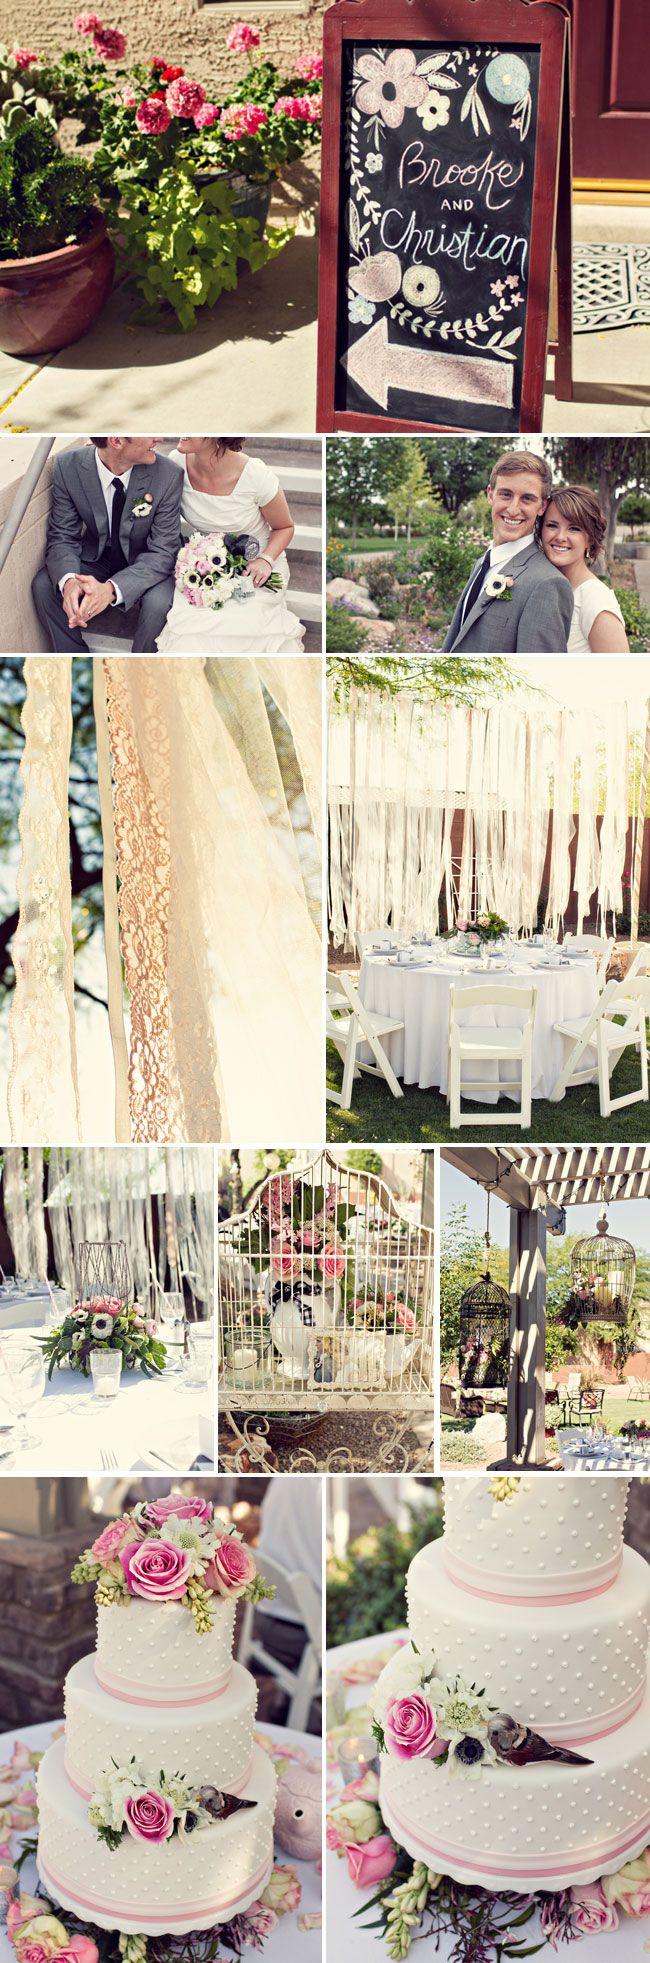 54 best love bird themed party images on pinterest wedding love bird theme wedding glendalough manor bride blog archive love birds wedding theme junglespirit Choice Image